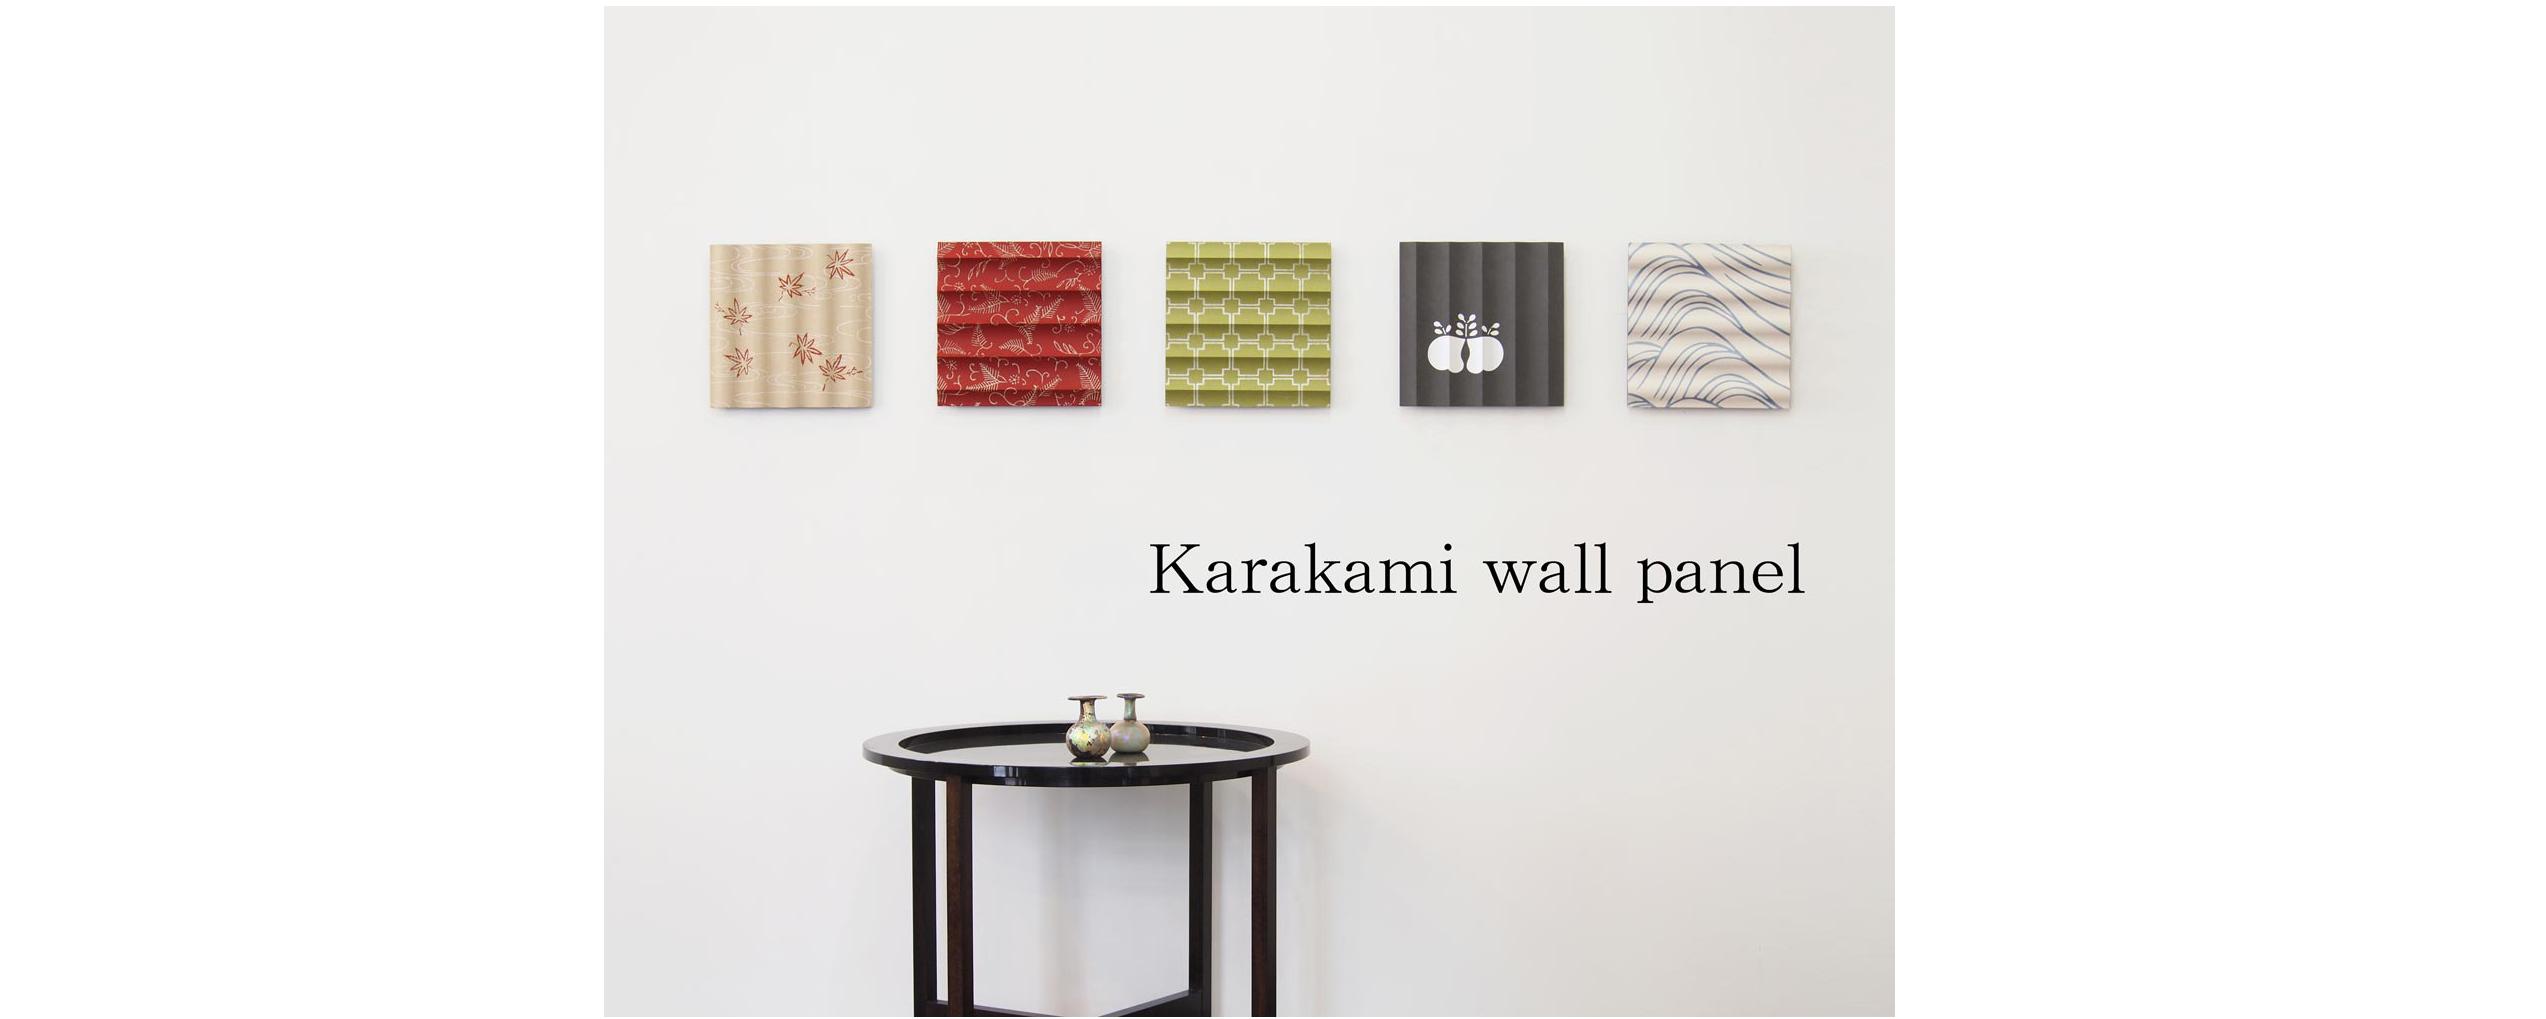 Karakami wall panel 京からかみの立体的壁掛けパネル